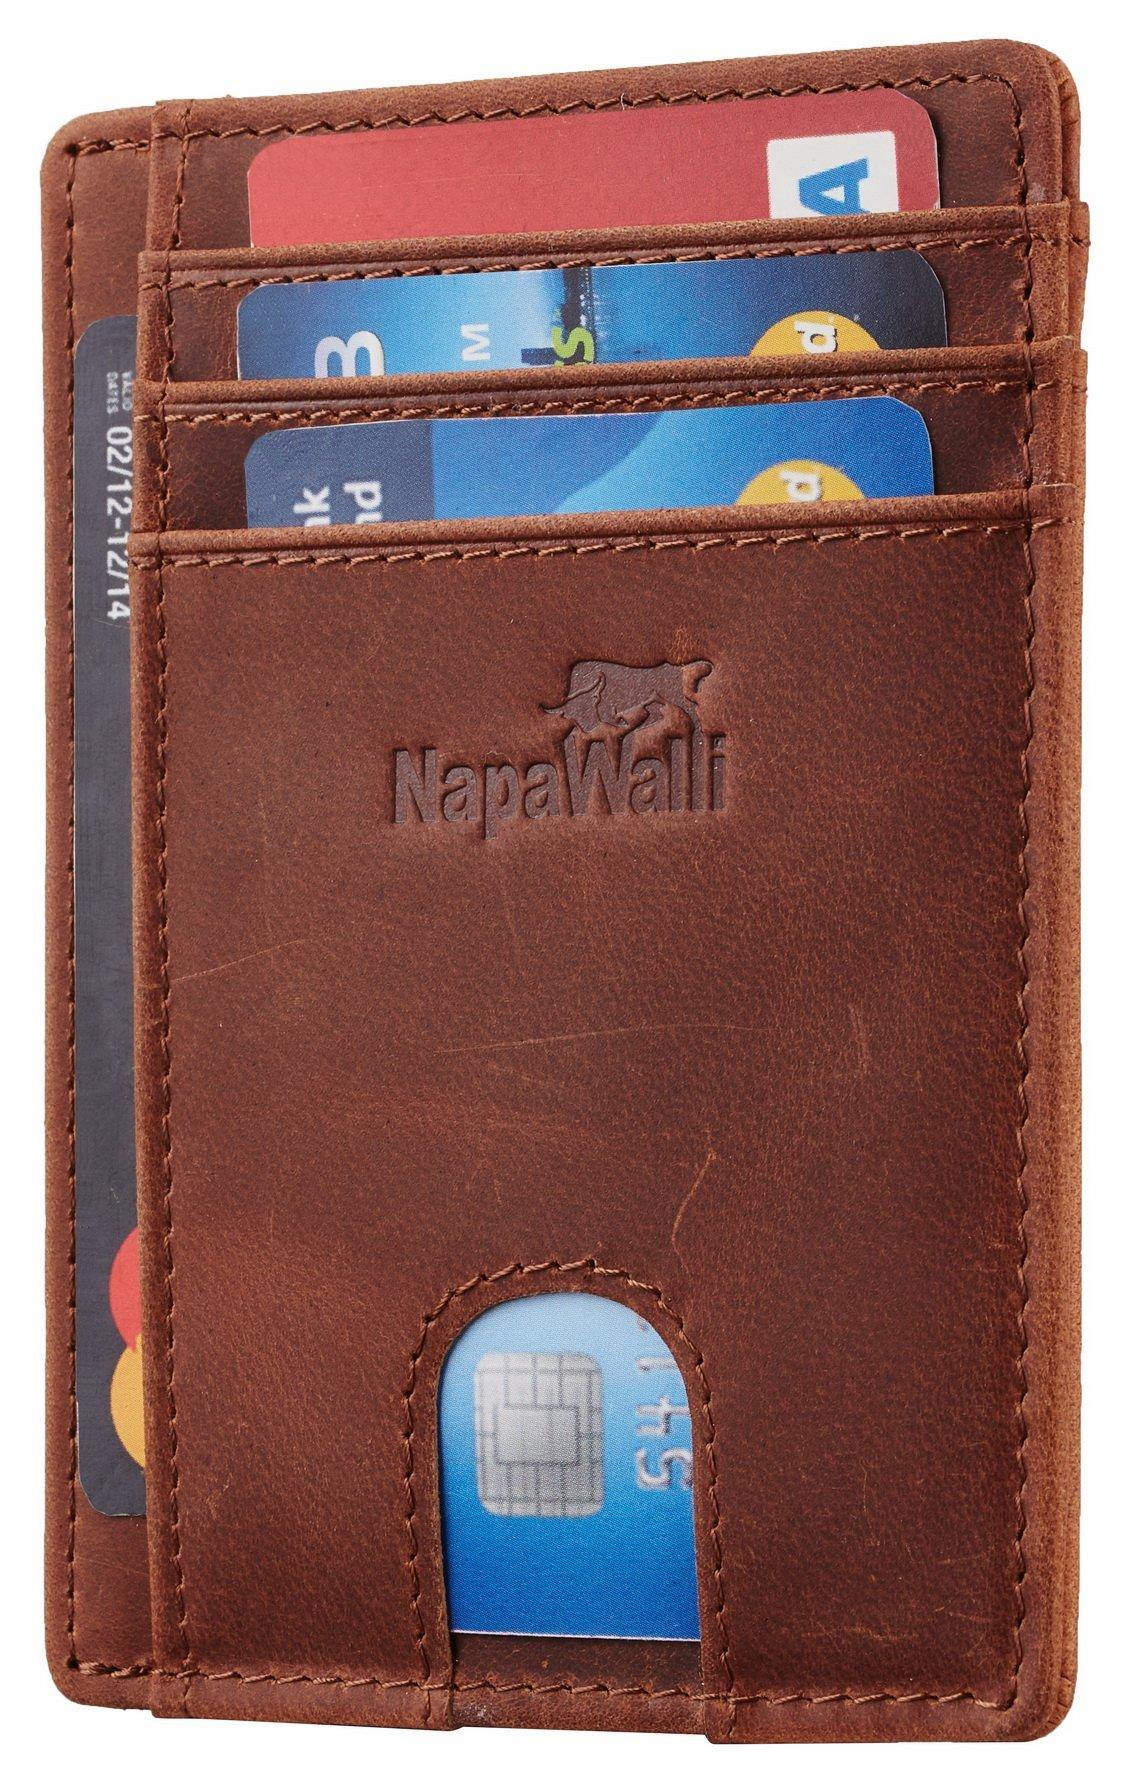 bbd4f9c6b96c8b Napawalli Rfid Blocking Minimalist Genuine Leather Slim Front Pocket Wallet